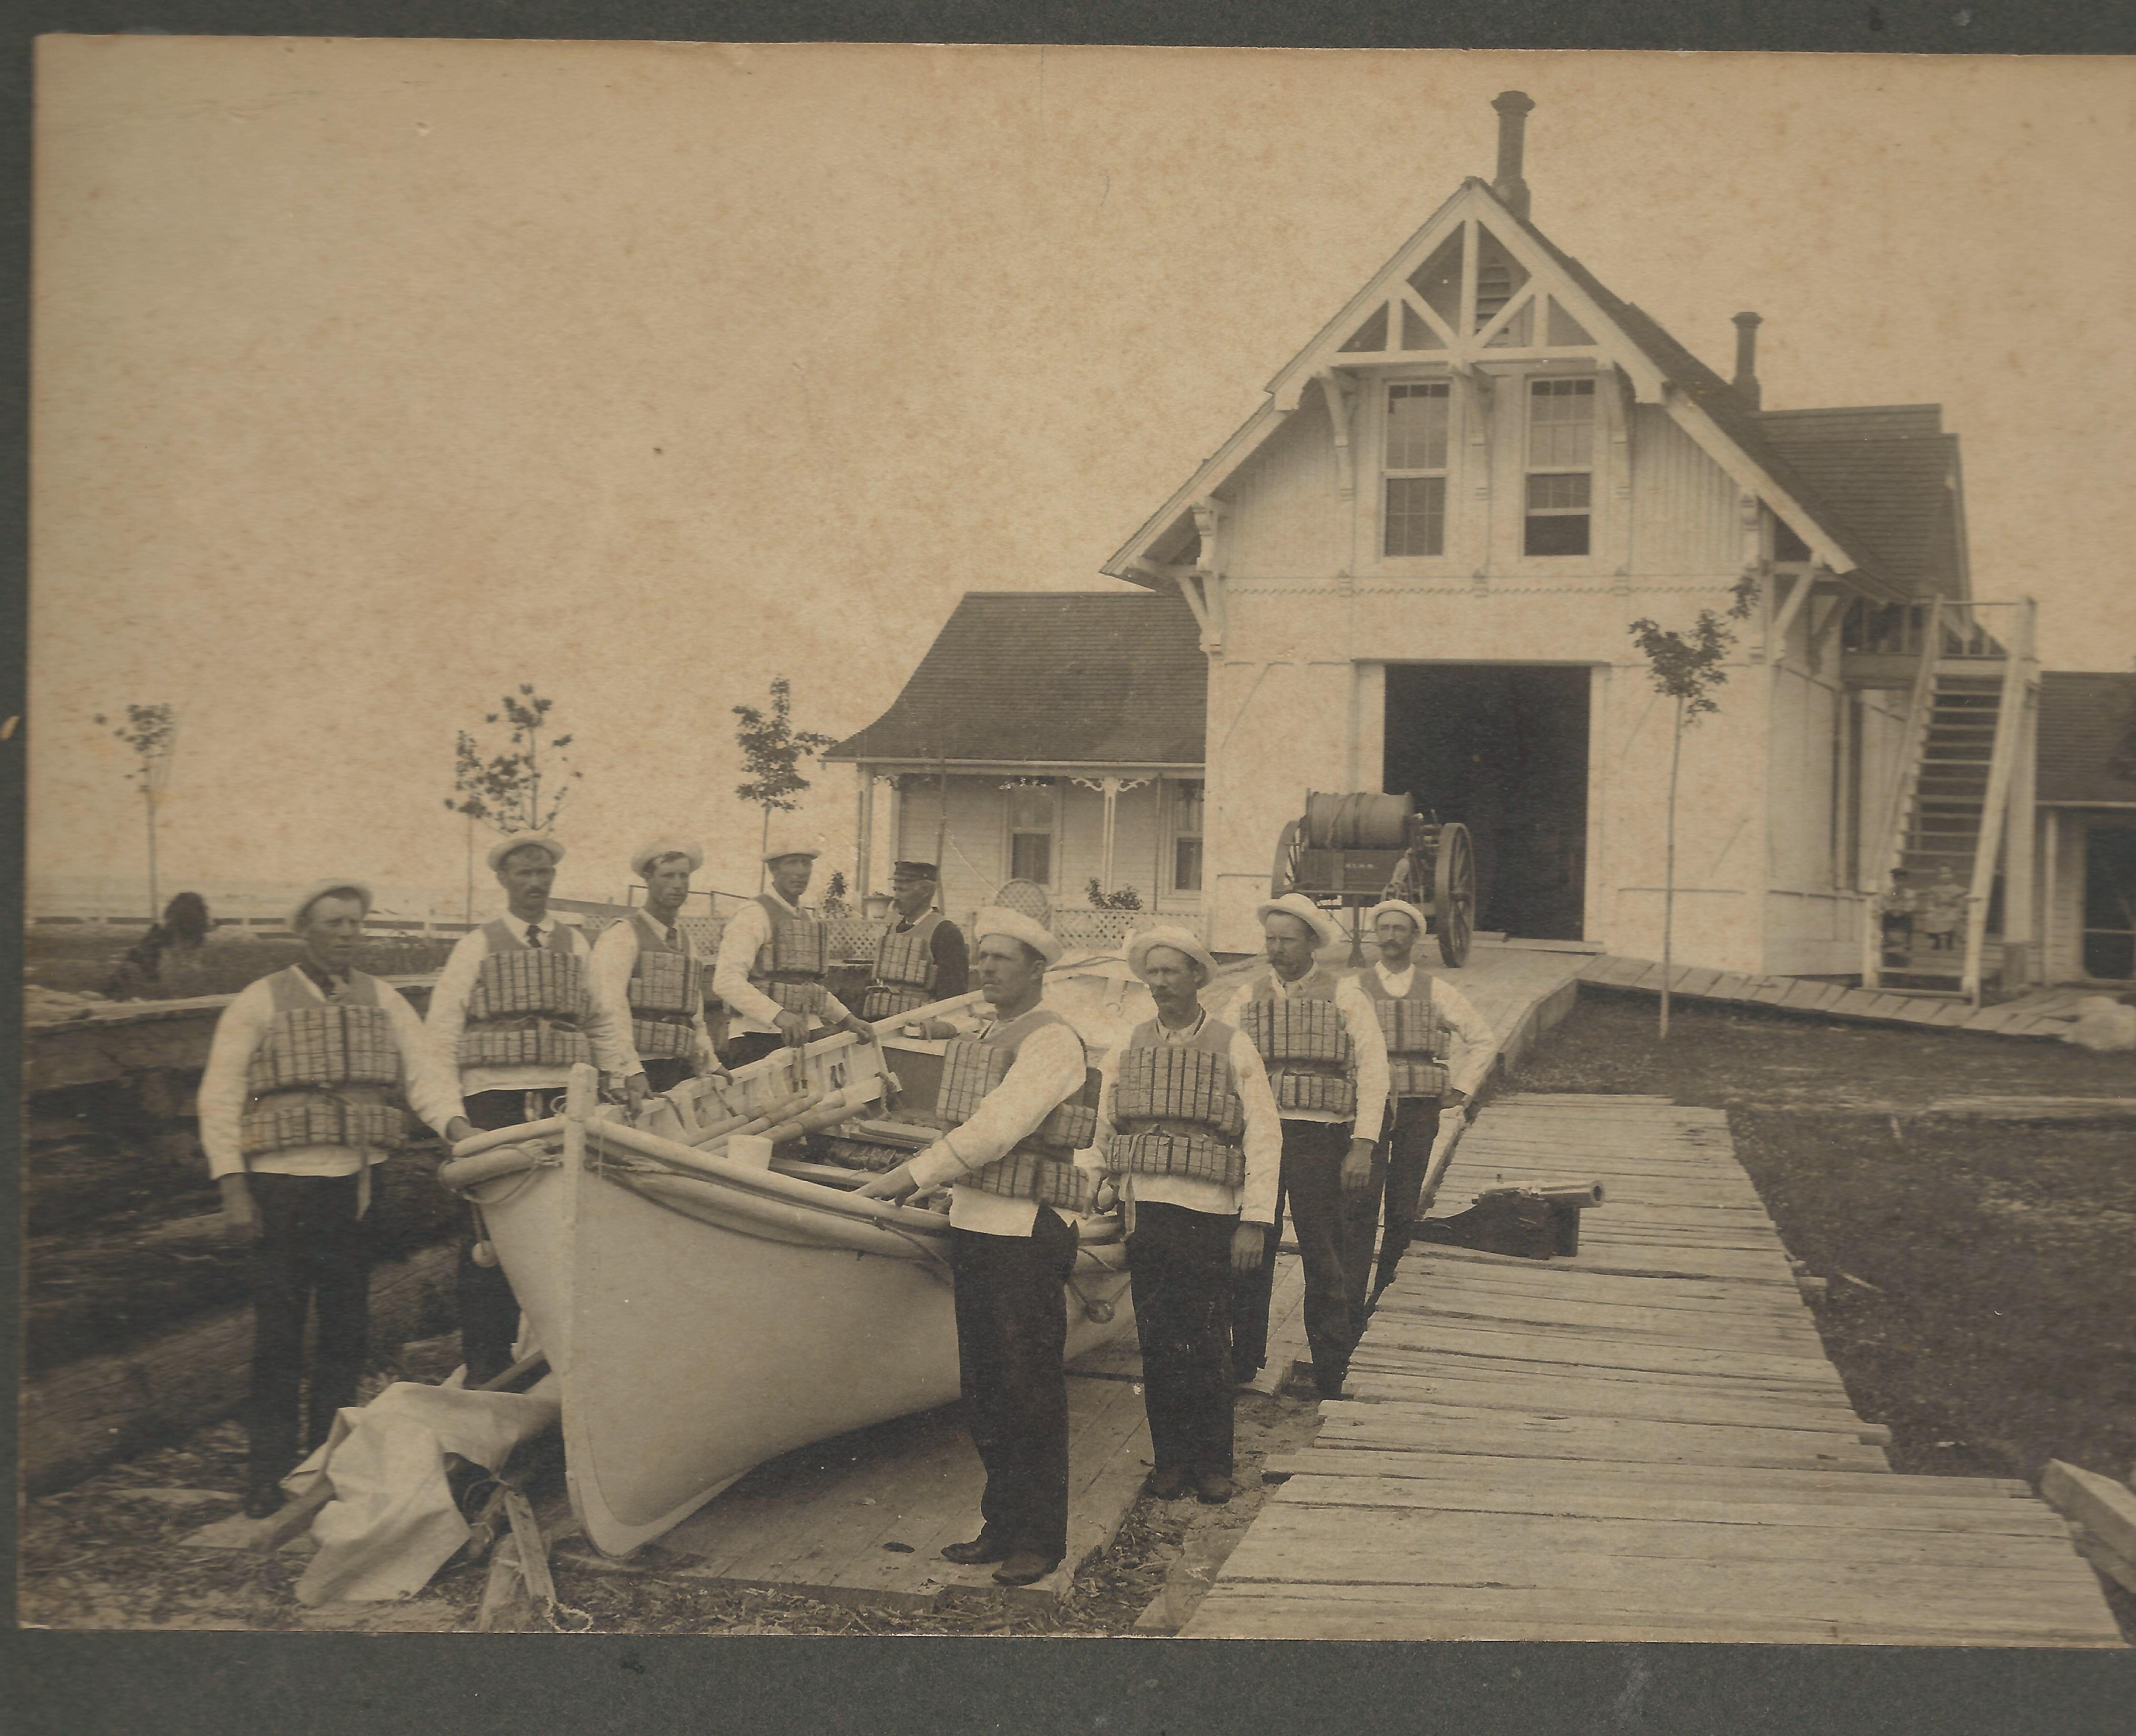 Two Heart Bay Life Saving Station, lifeboat crew, Michigan, 1902